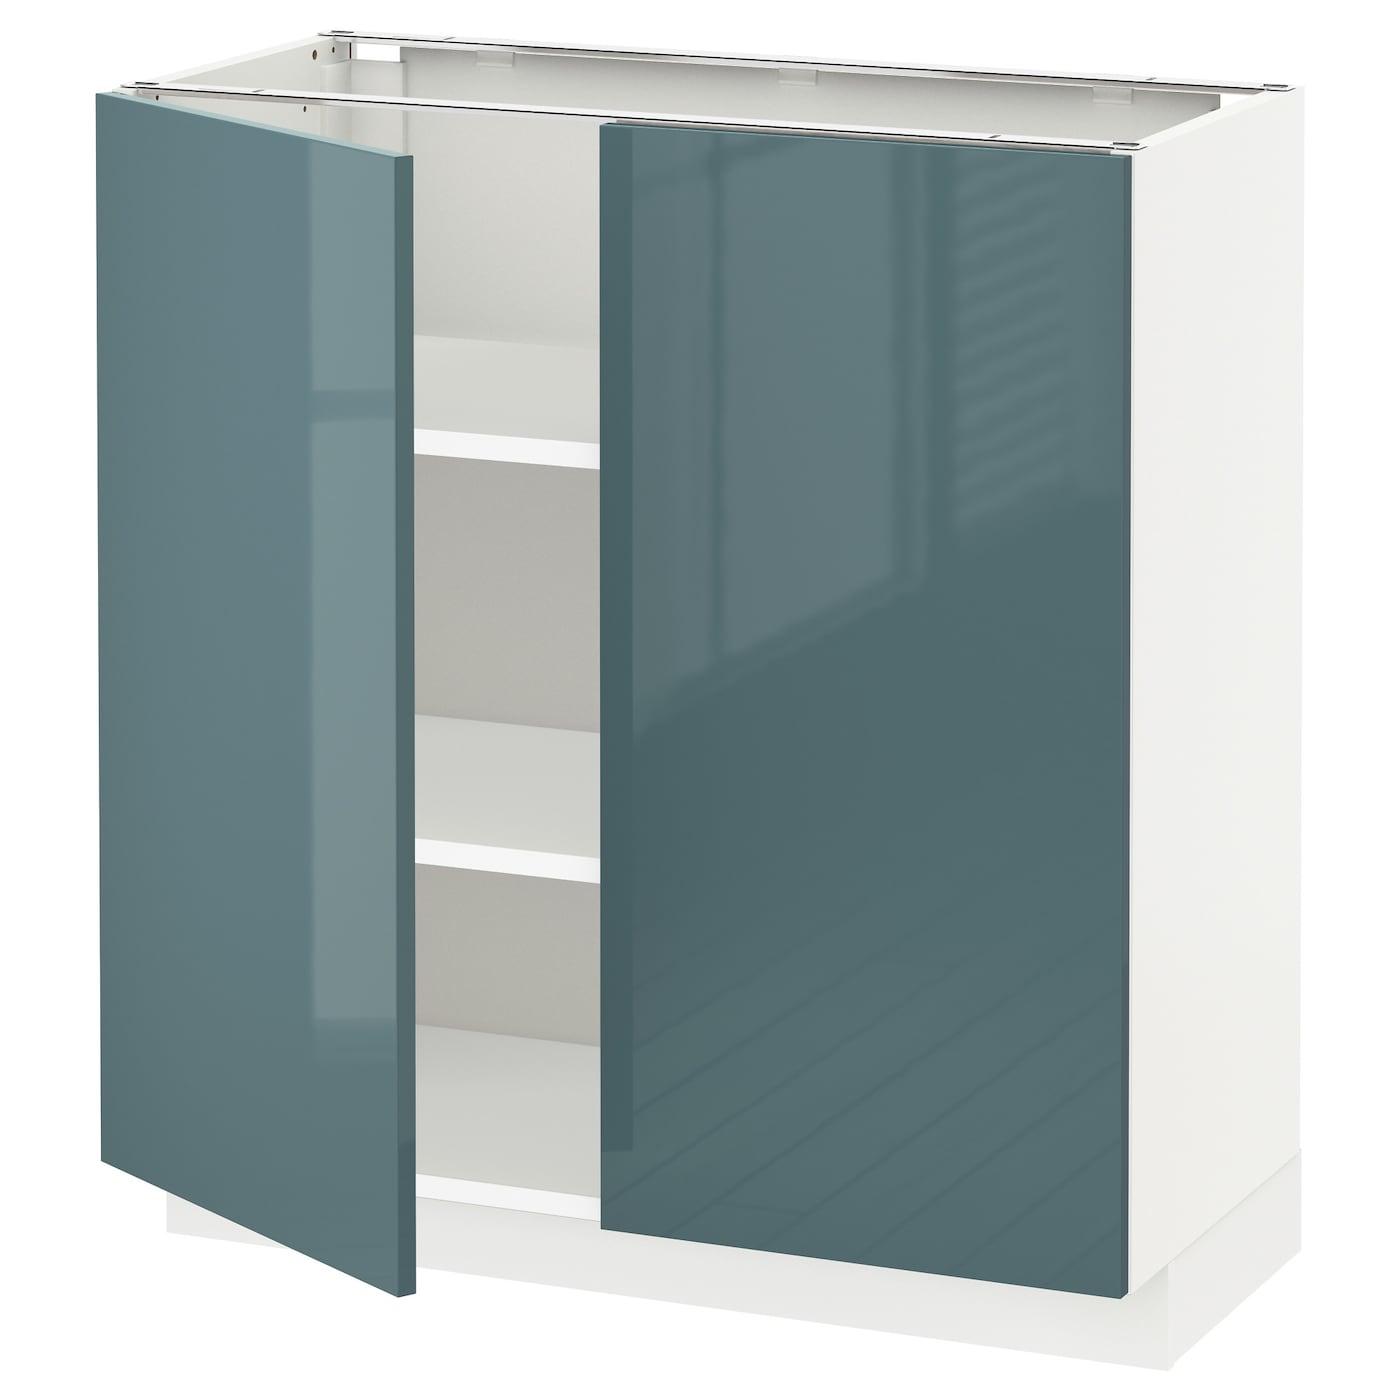 Metod Base Cabinet With Shelves 2 Doors White Kallarp Grey Turquoise